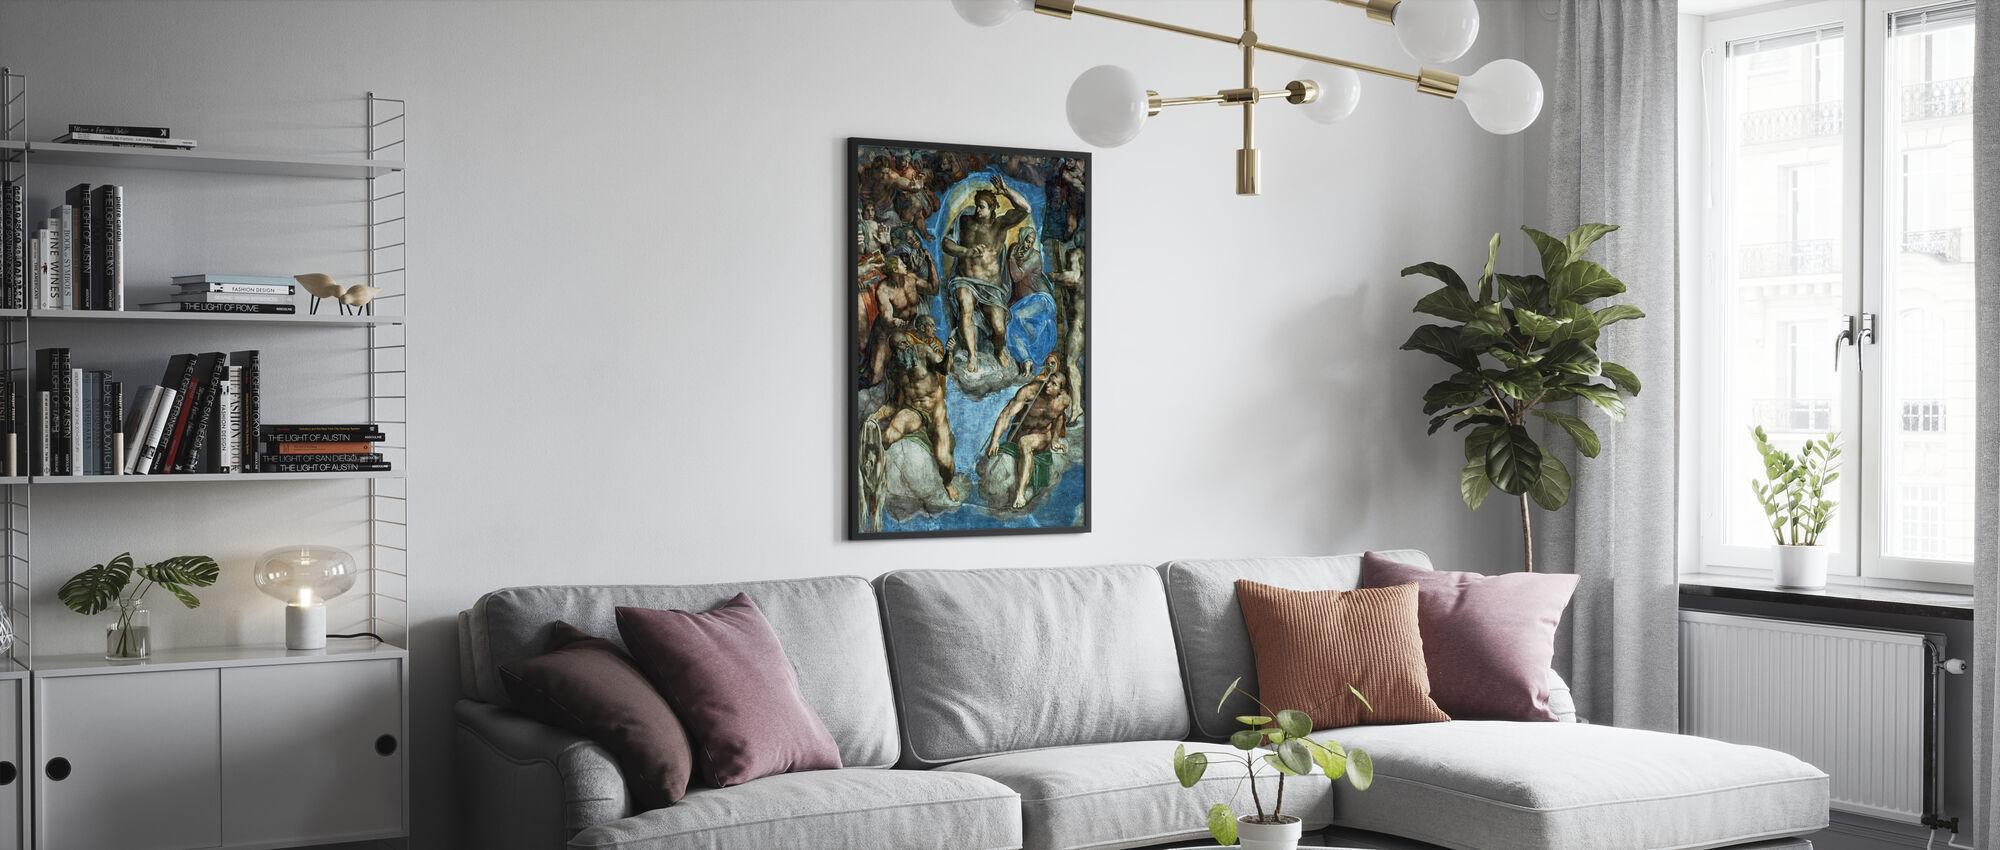 Jugement dernier - Michelangelo Buonarroti - Affiche - Salle à manger